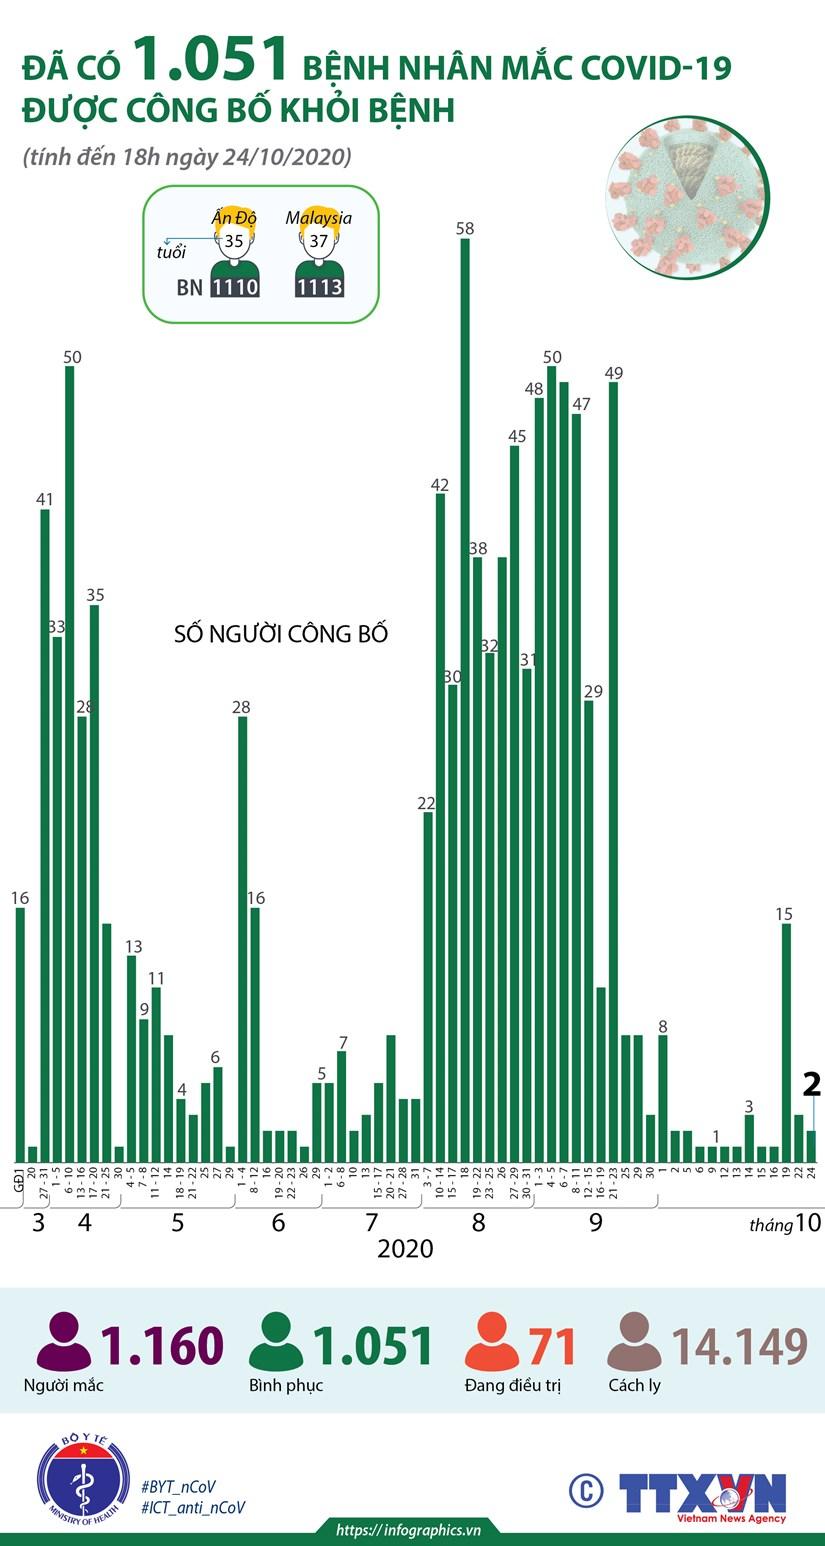 [Infographics] Da co 1.051 benh nhan COVID-19 duoc cong bo khoi benh hinh anh 1